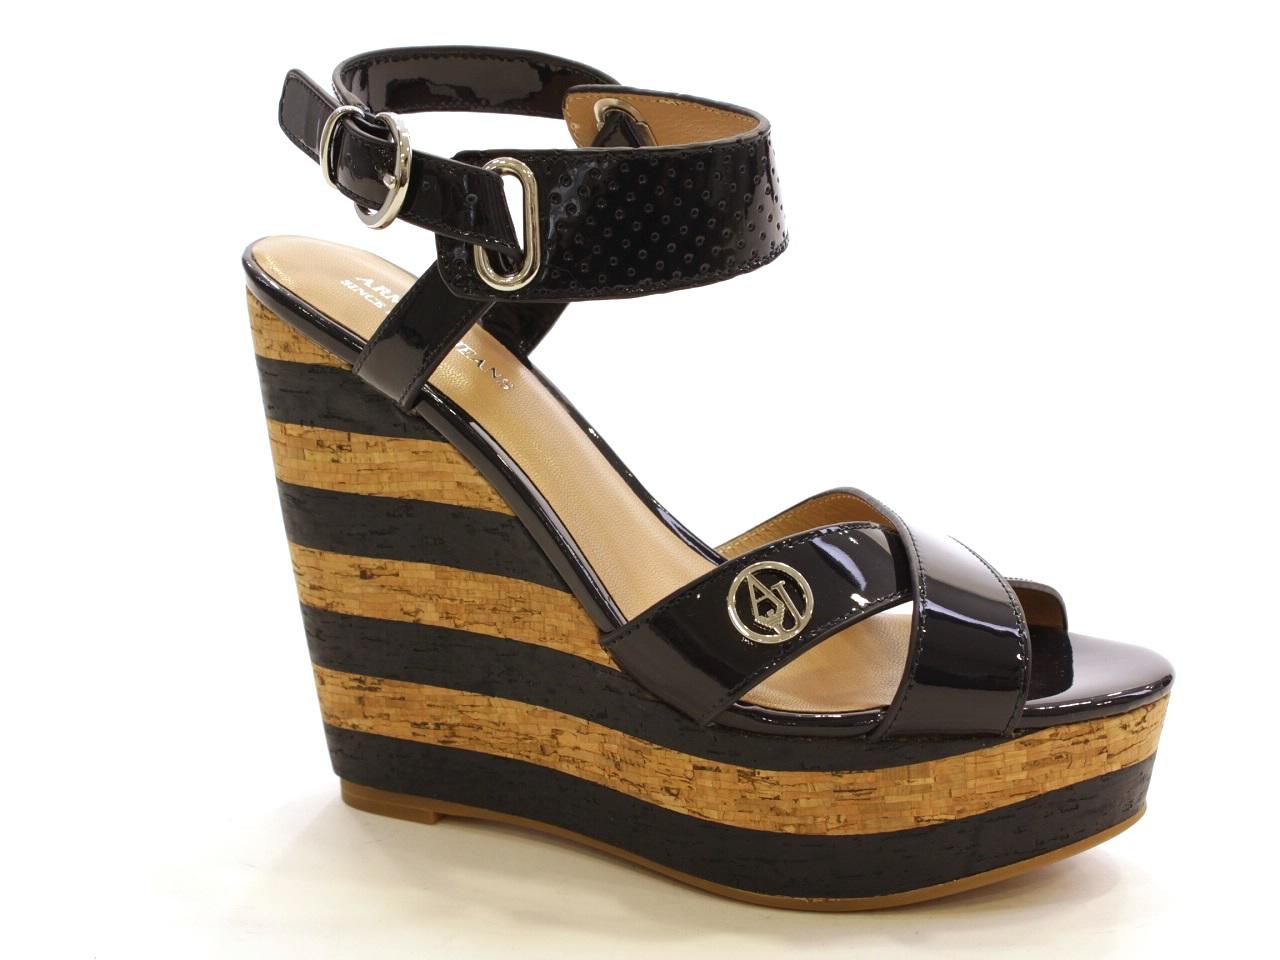 Wedge Sandals Armani, Emporio - 529 V5595